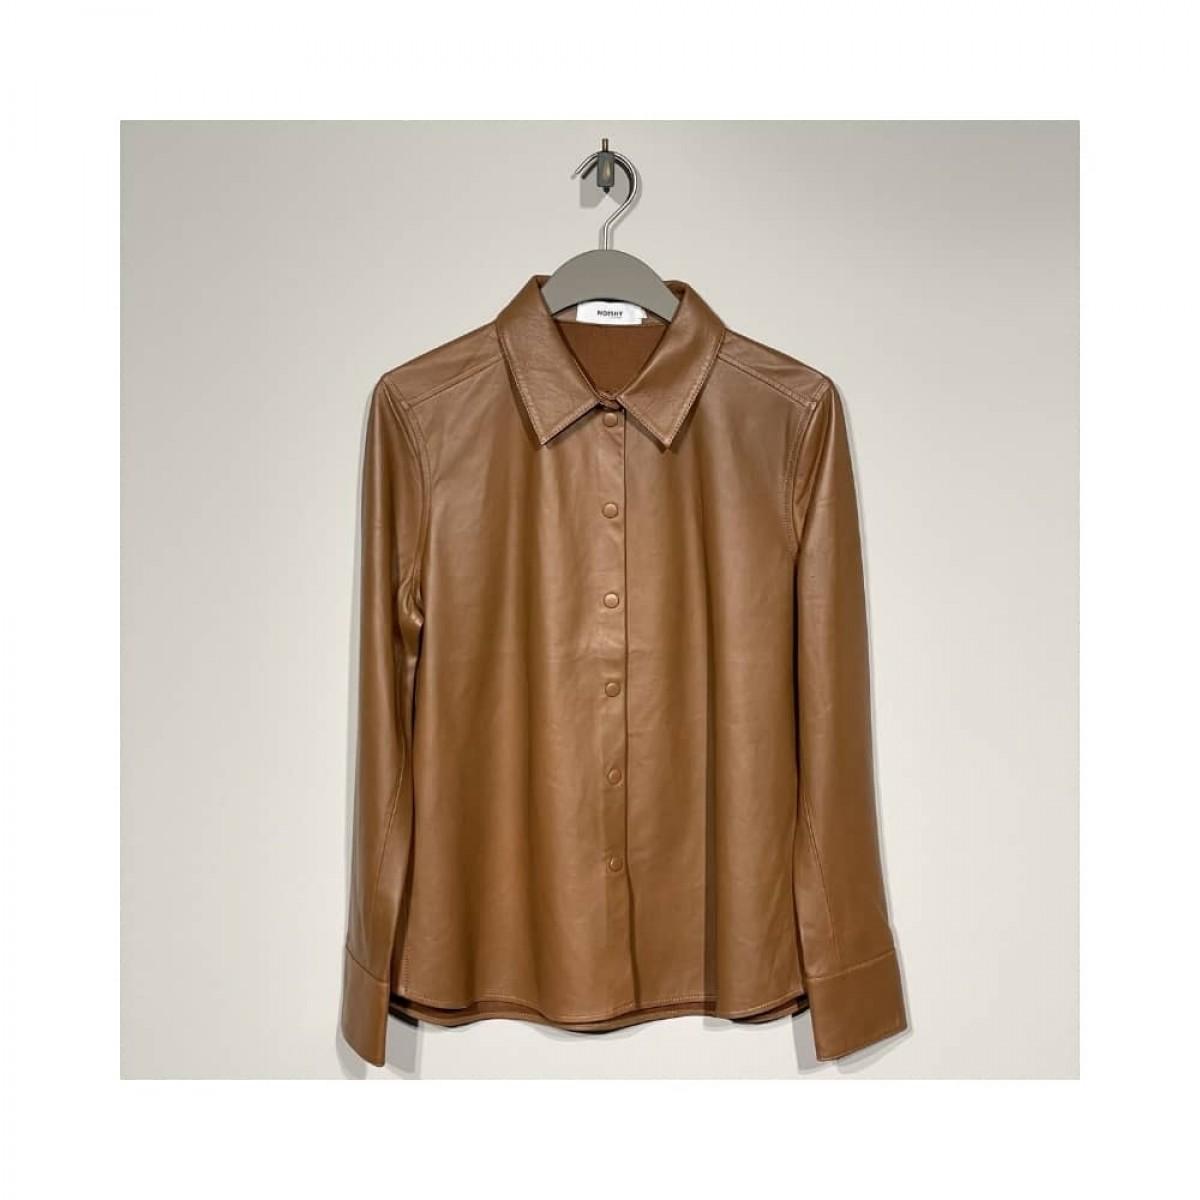 skind skjorte - cognac